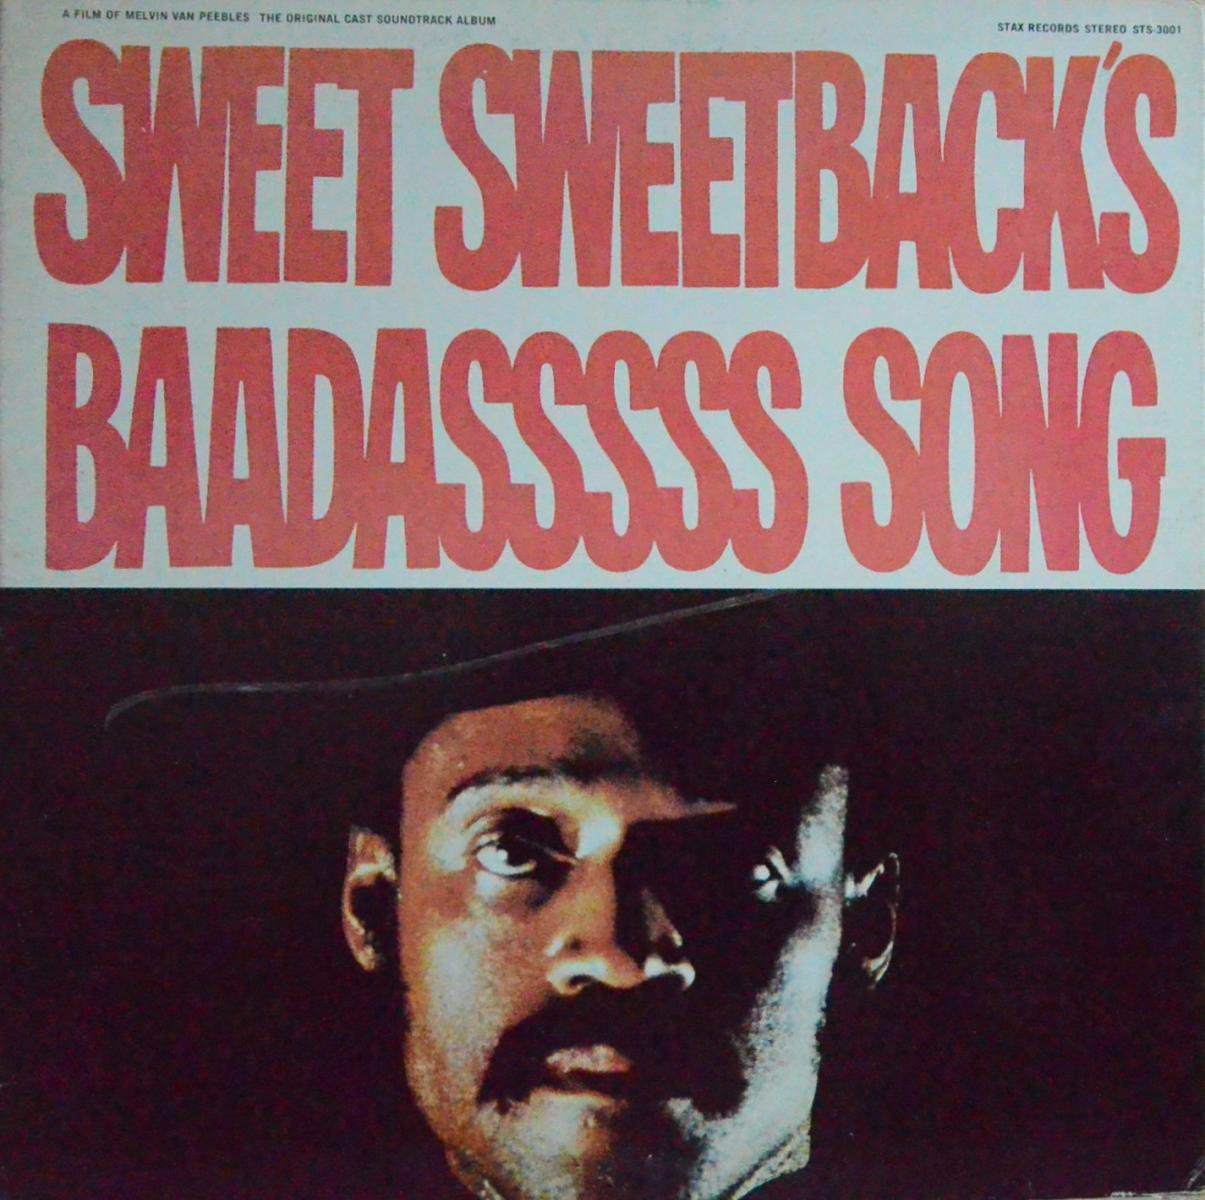 O.S.T.(MELVIN VAN PEEBLES) / SWEET SWEETBACK'S BAADASSSSS SONG (LP)